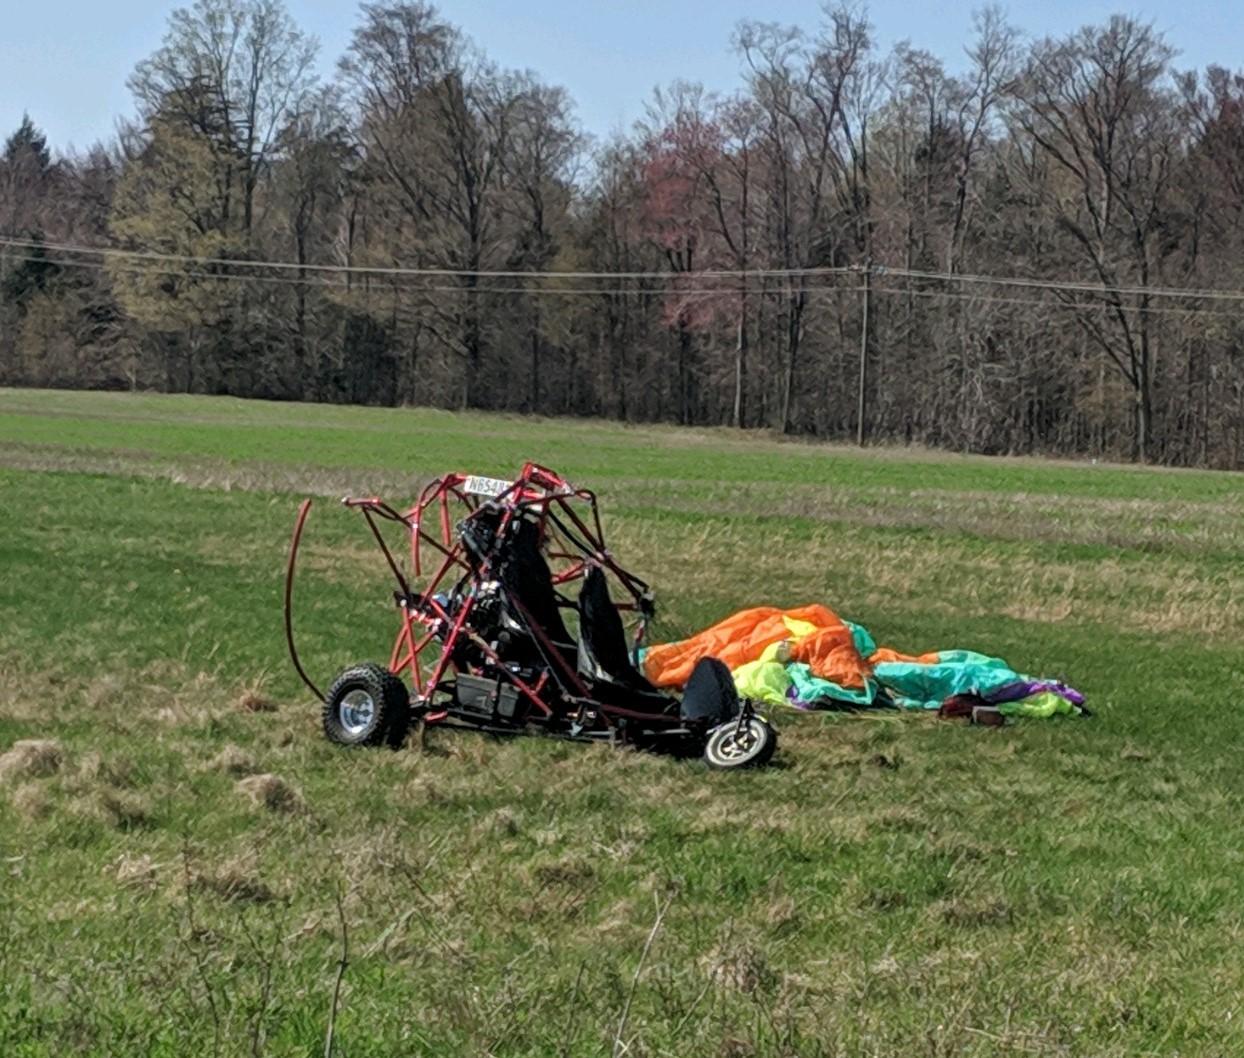 Man dies in powered parachute crash in Oceana County